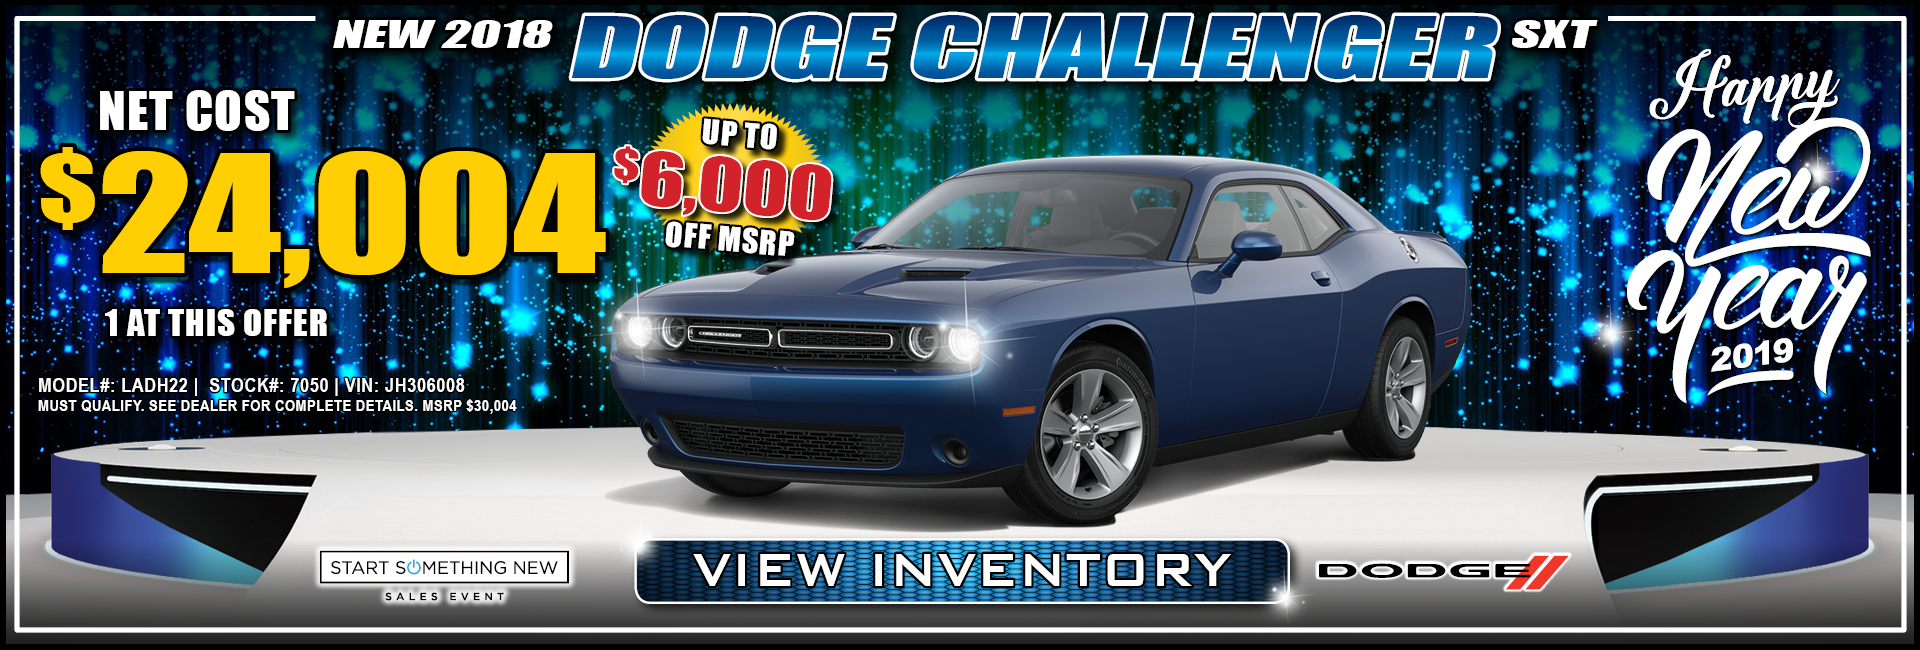 Dodge Challenger $24,004